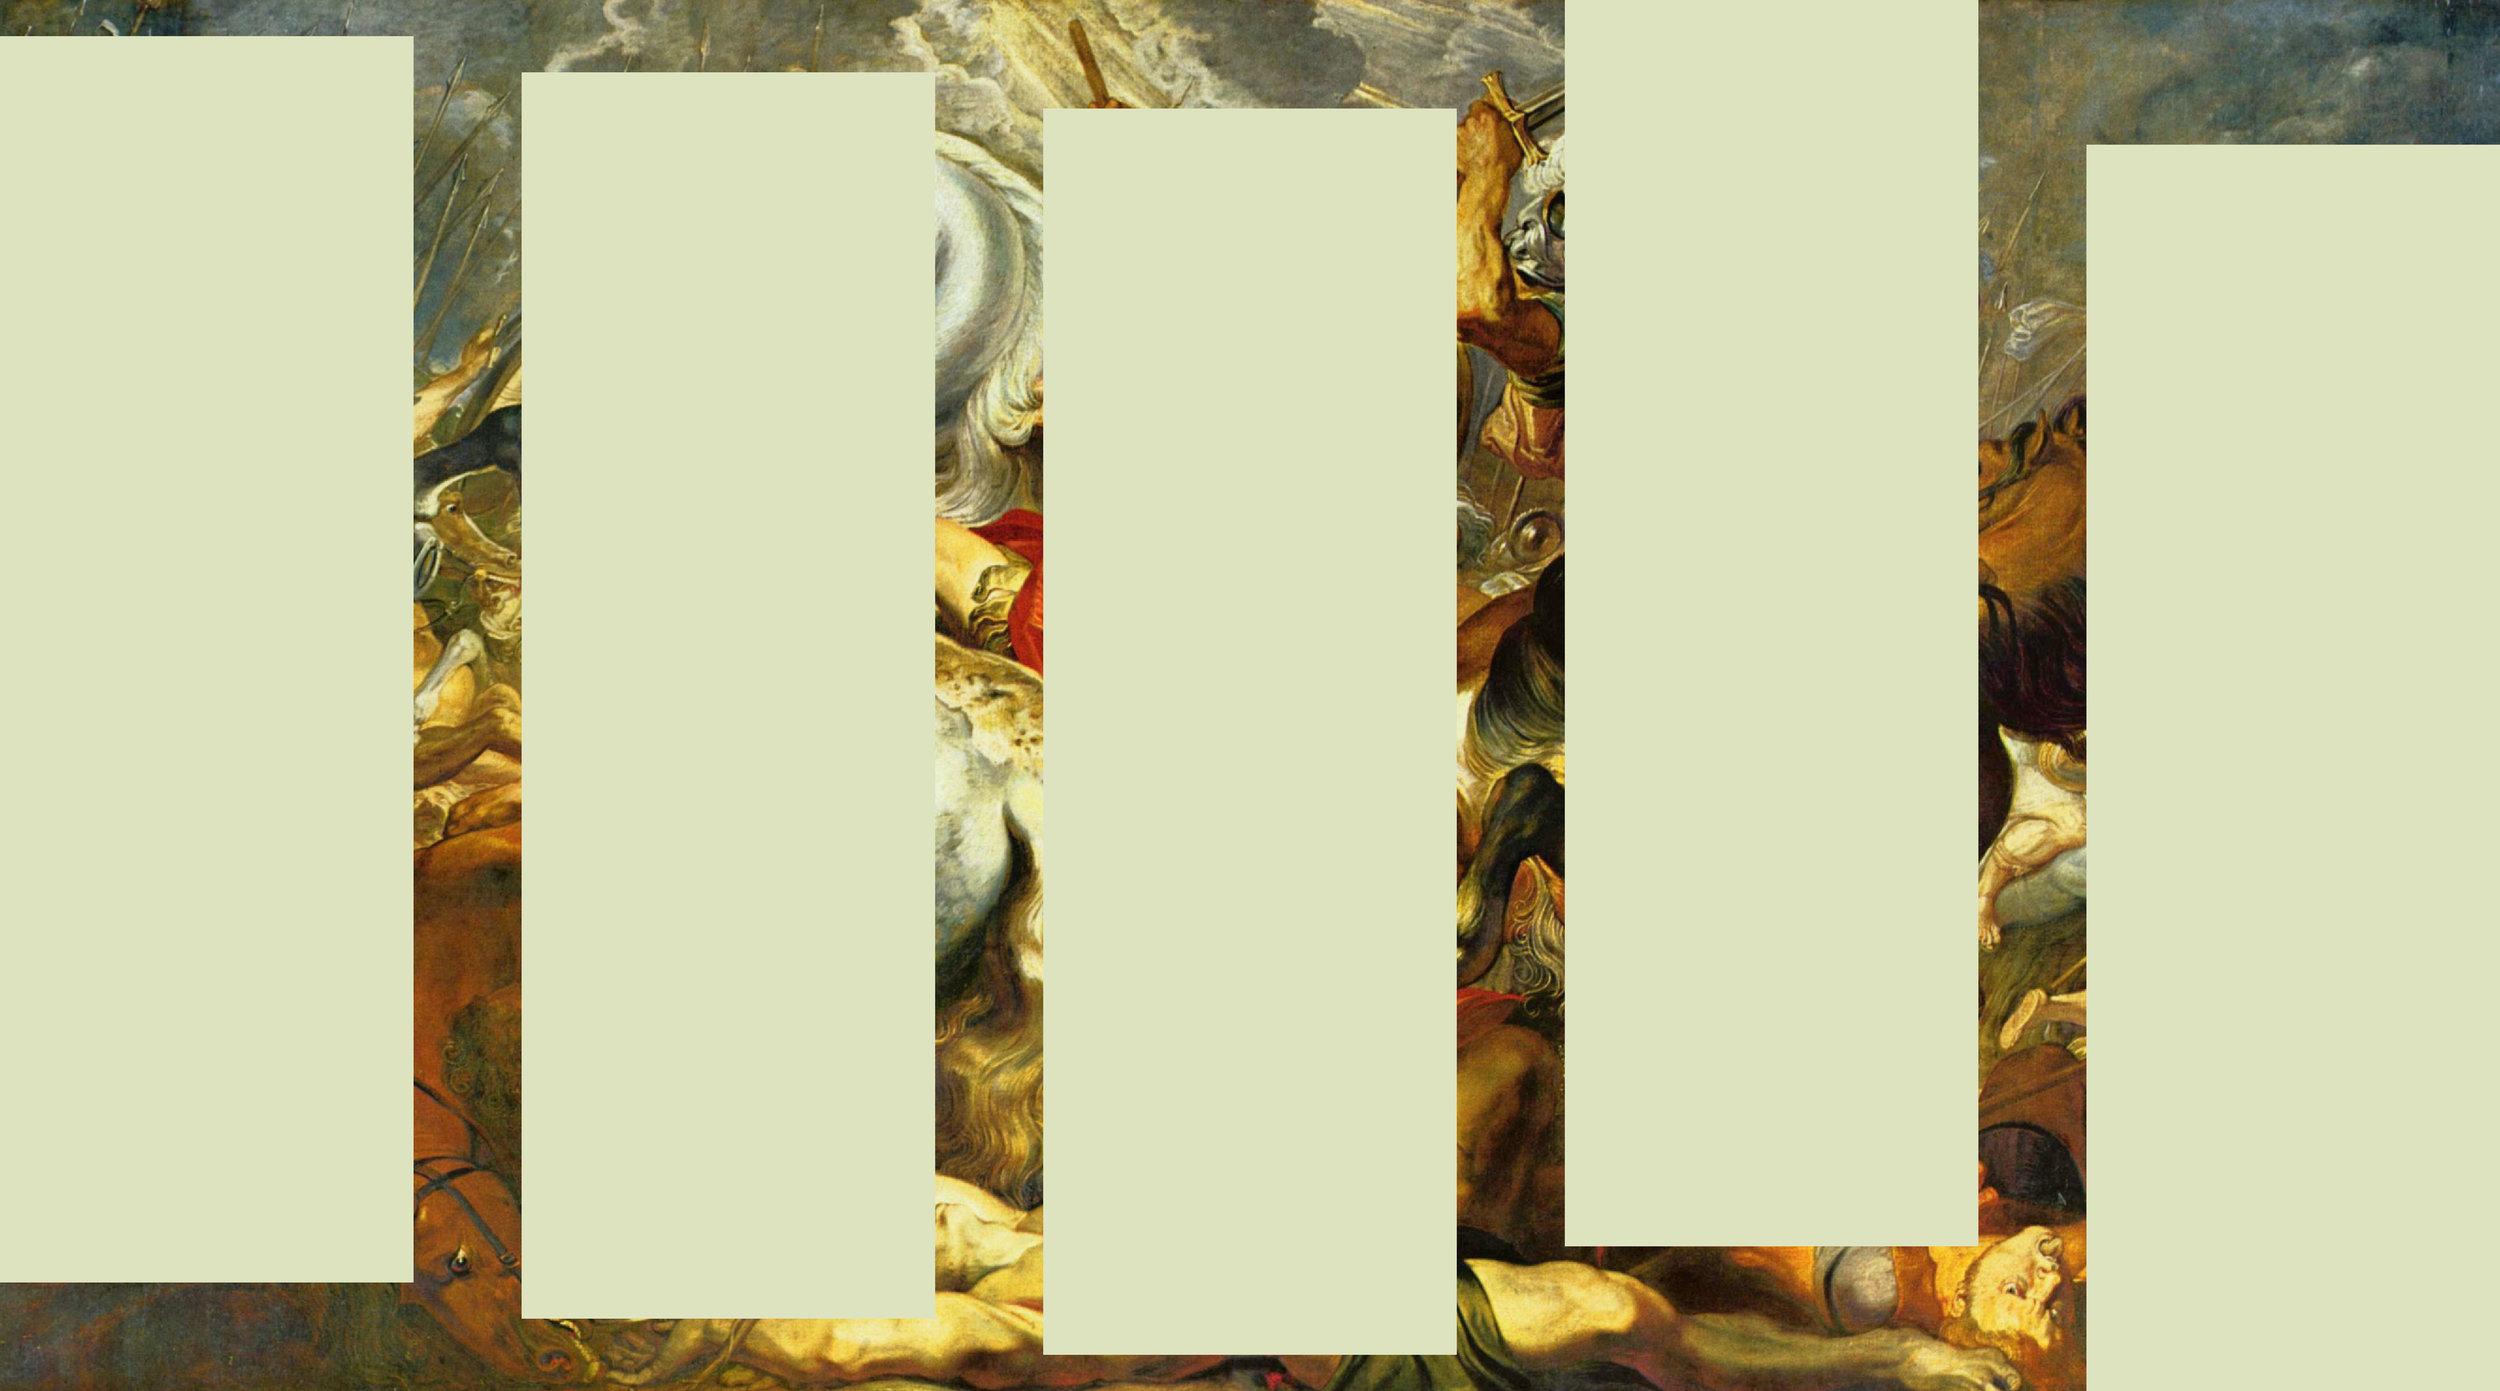 rubens / rectangles